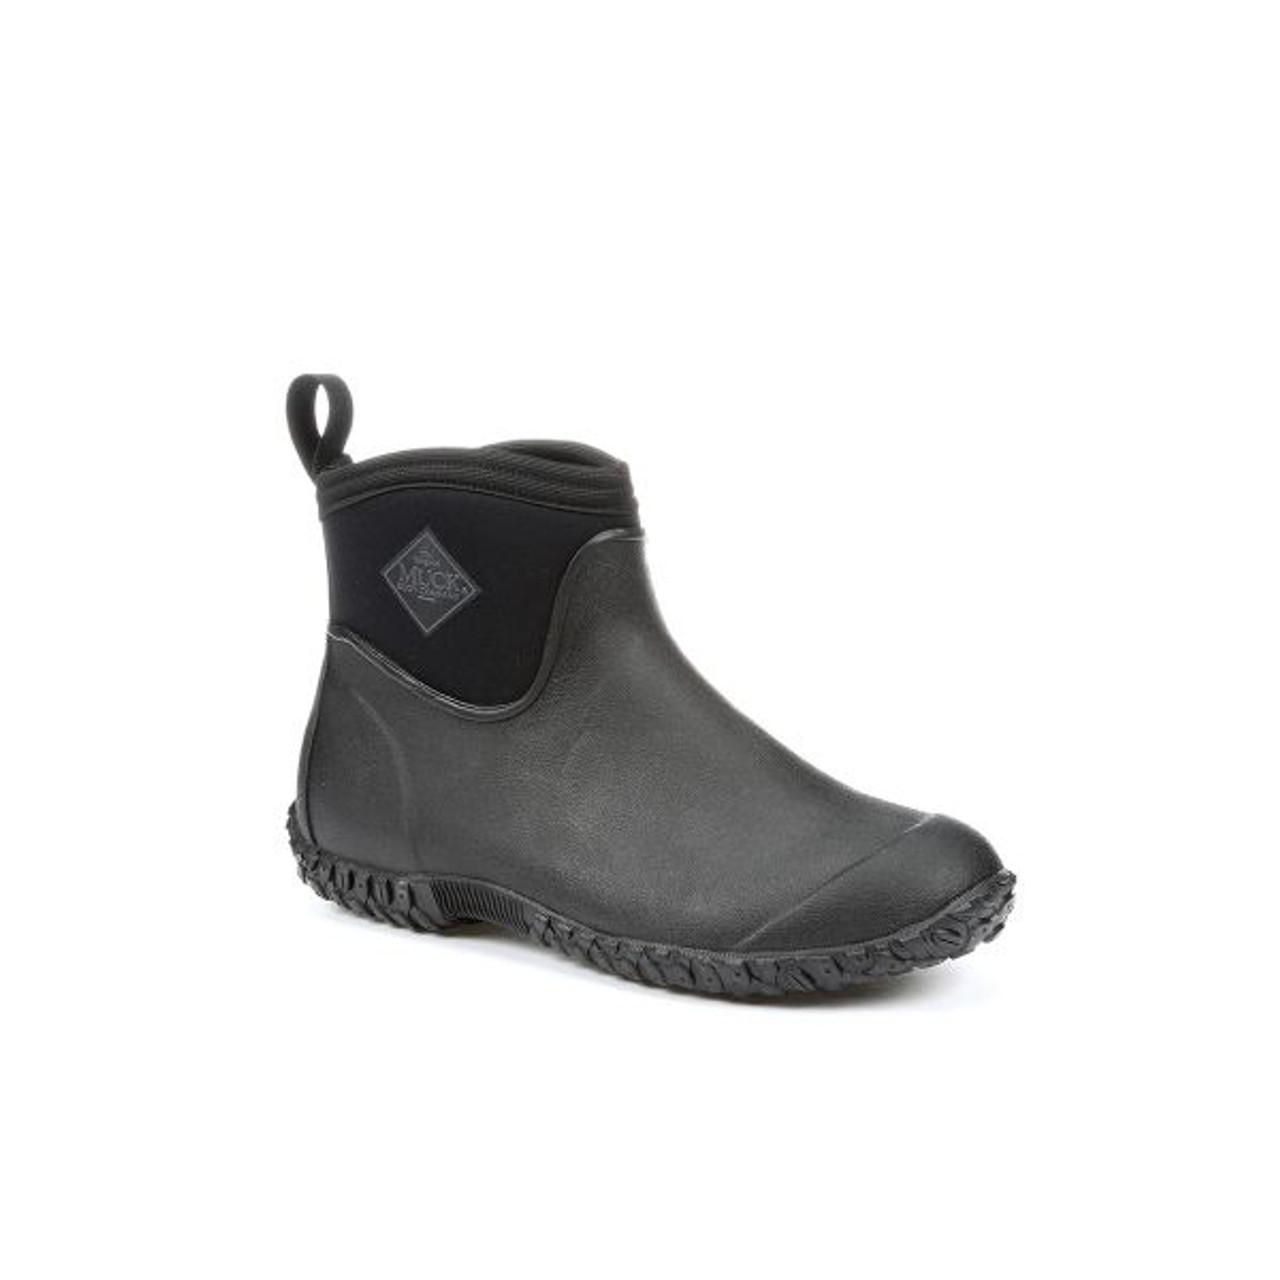 6efe2596dca7b5 Women s Muck Muckster 2 Ankle Boot - Herbert s Boots and Western Wear